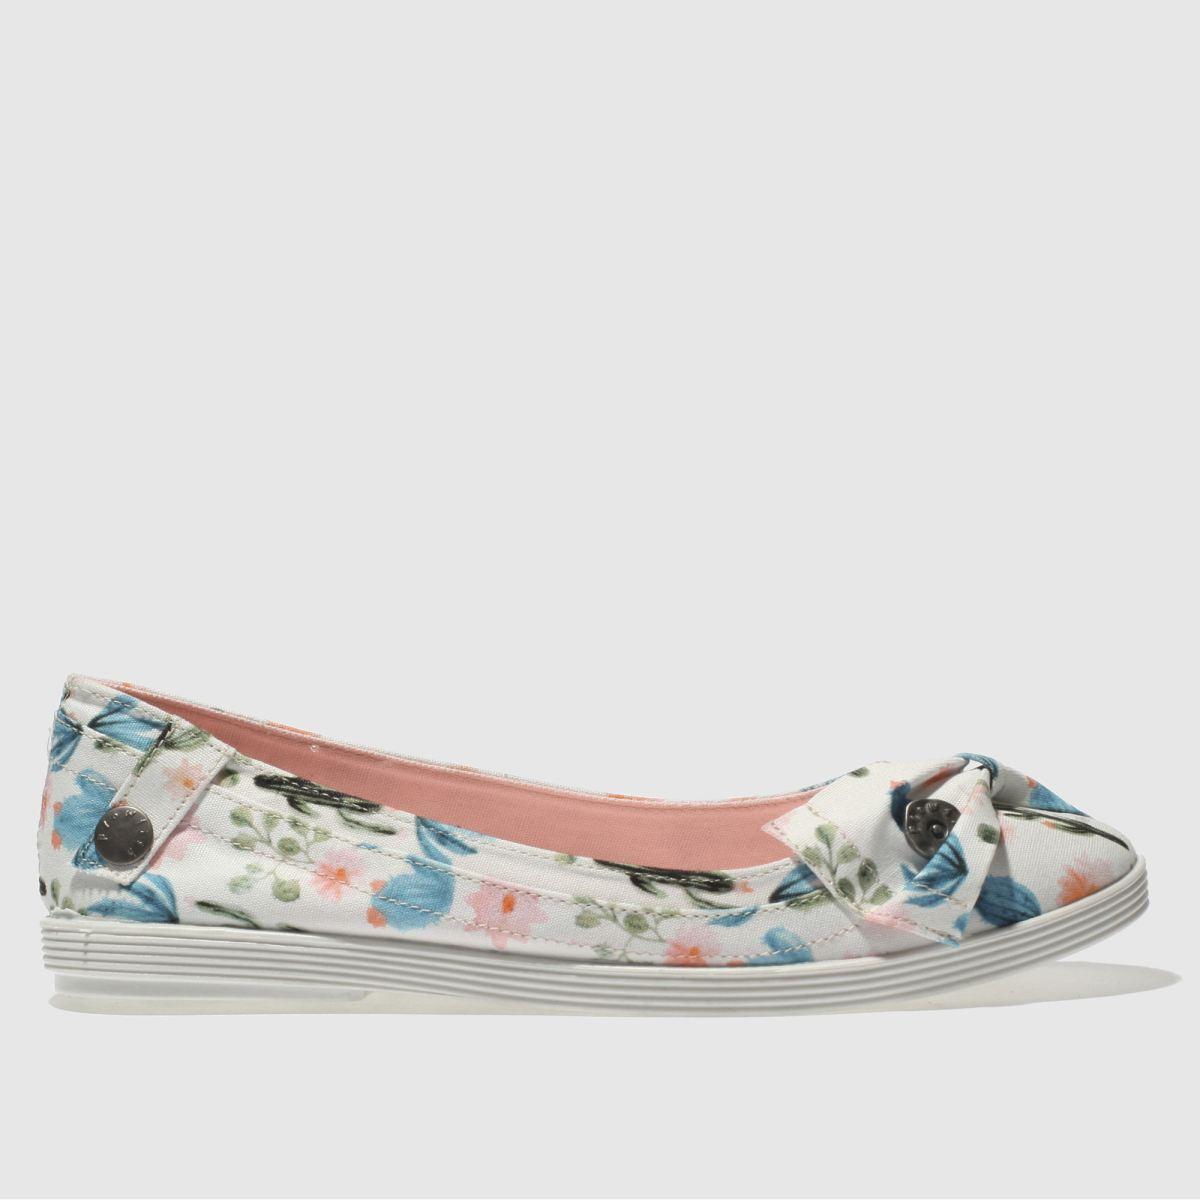 Blowfish Blowfish White & Pink Gimlet Flat Shoes